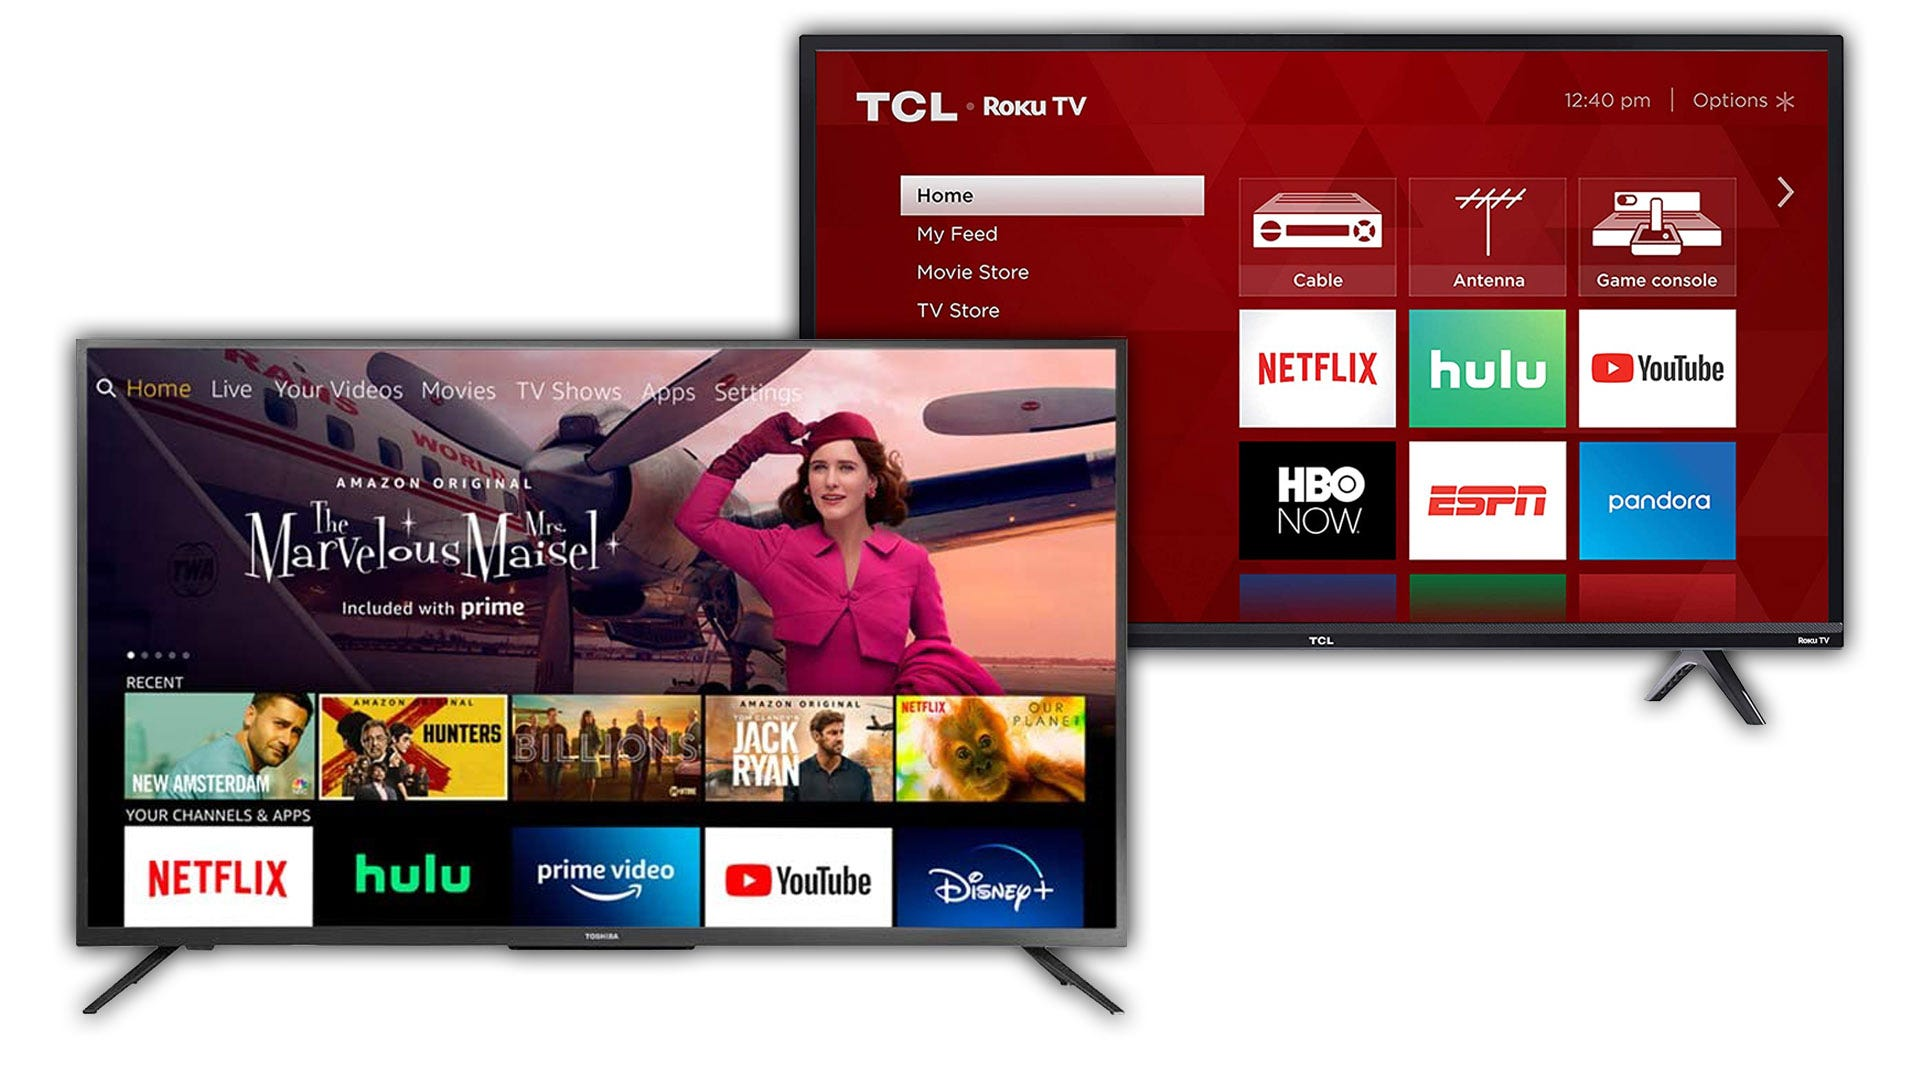 TCL Roku TV and Toshiba Amazon Fire TV